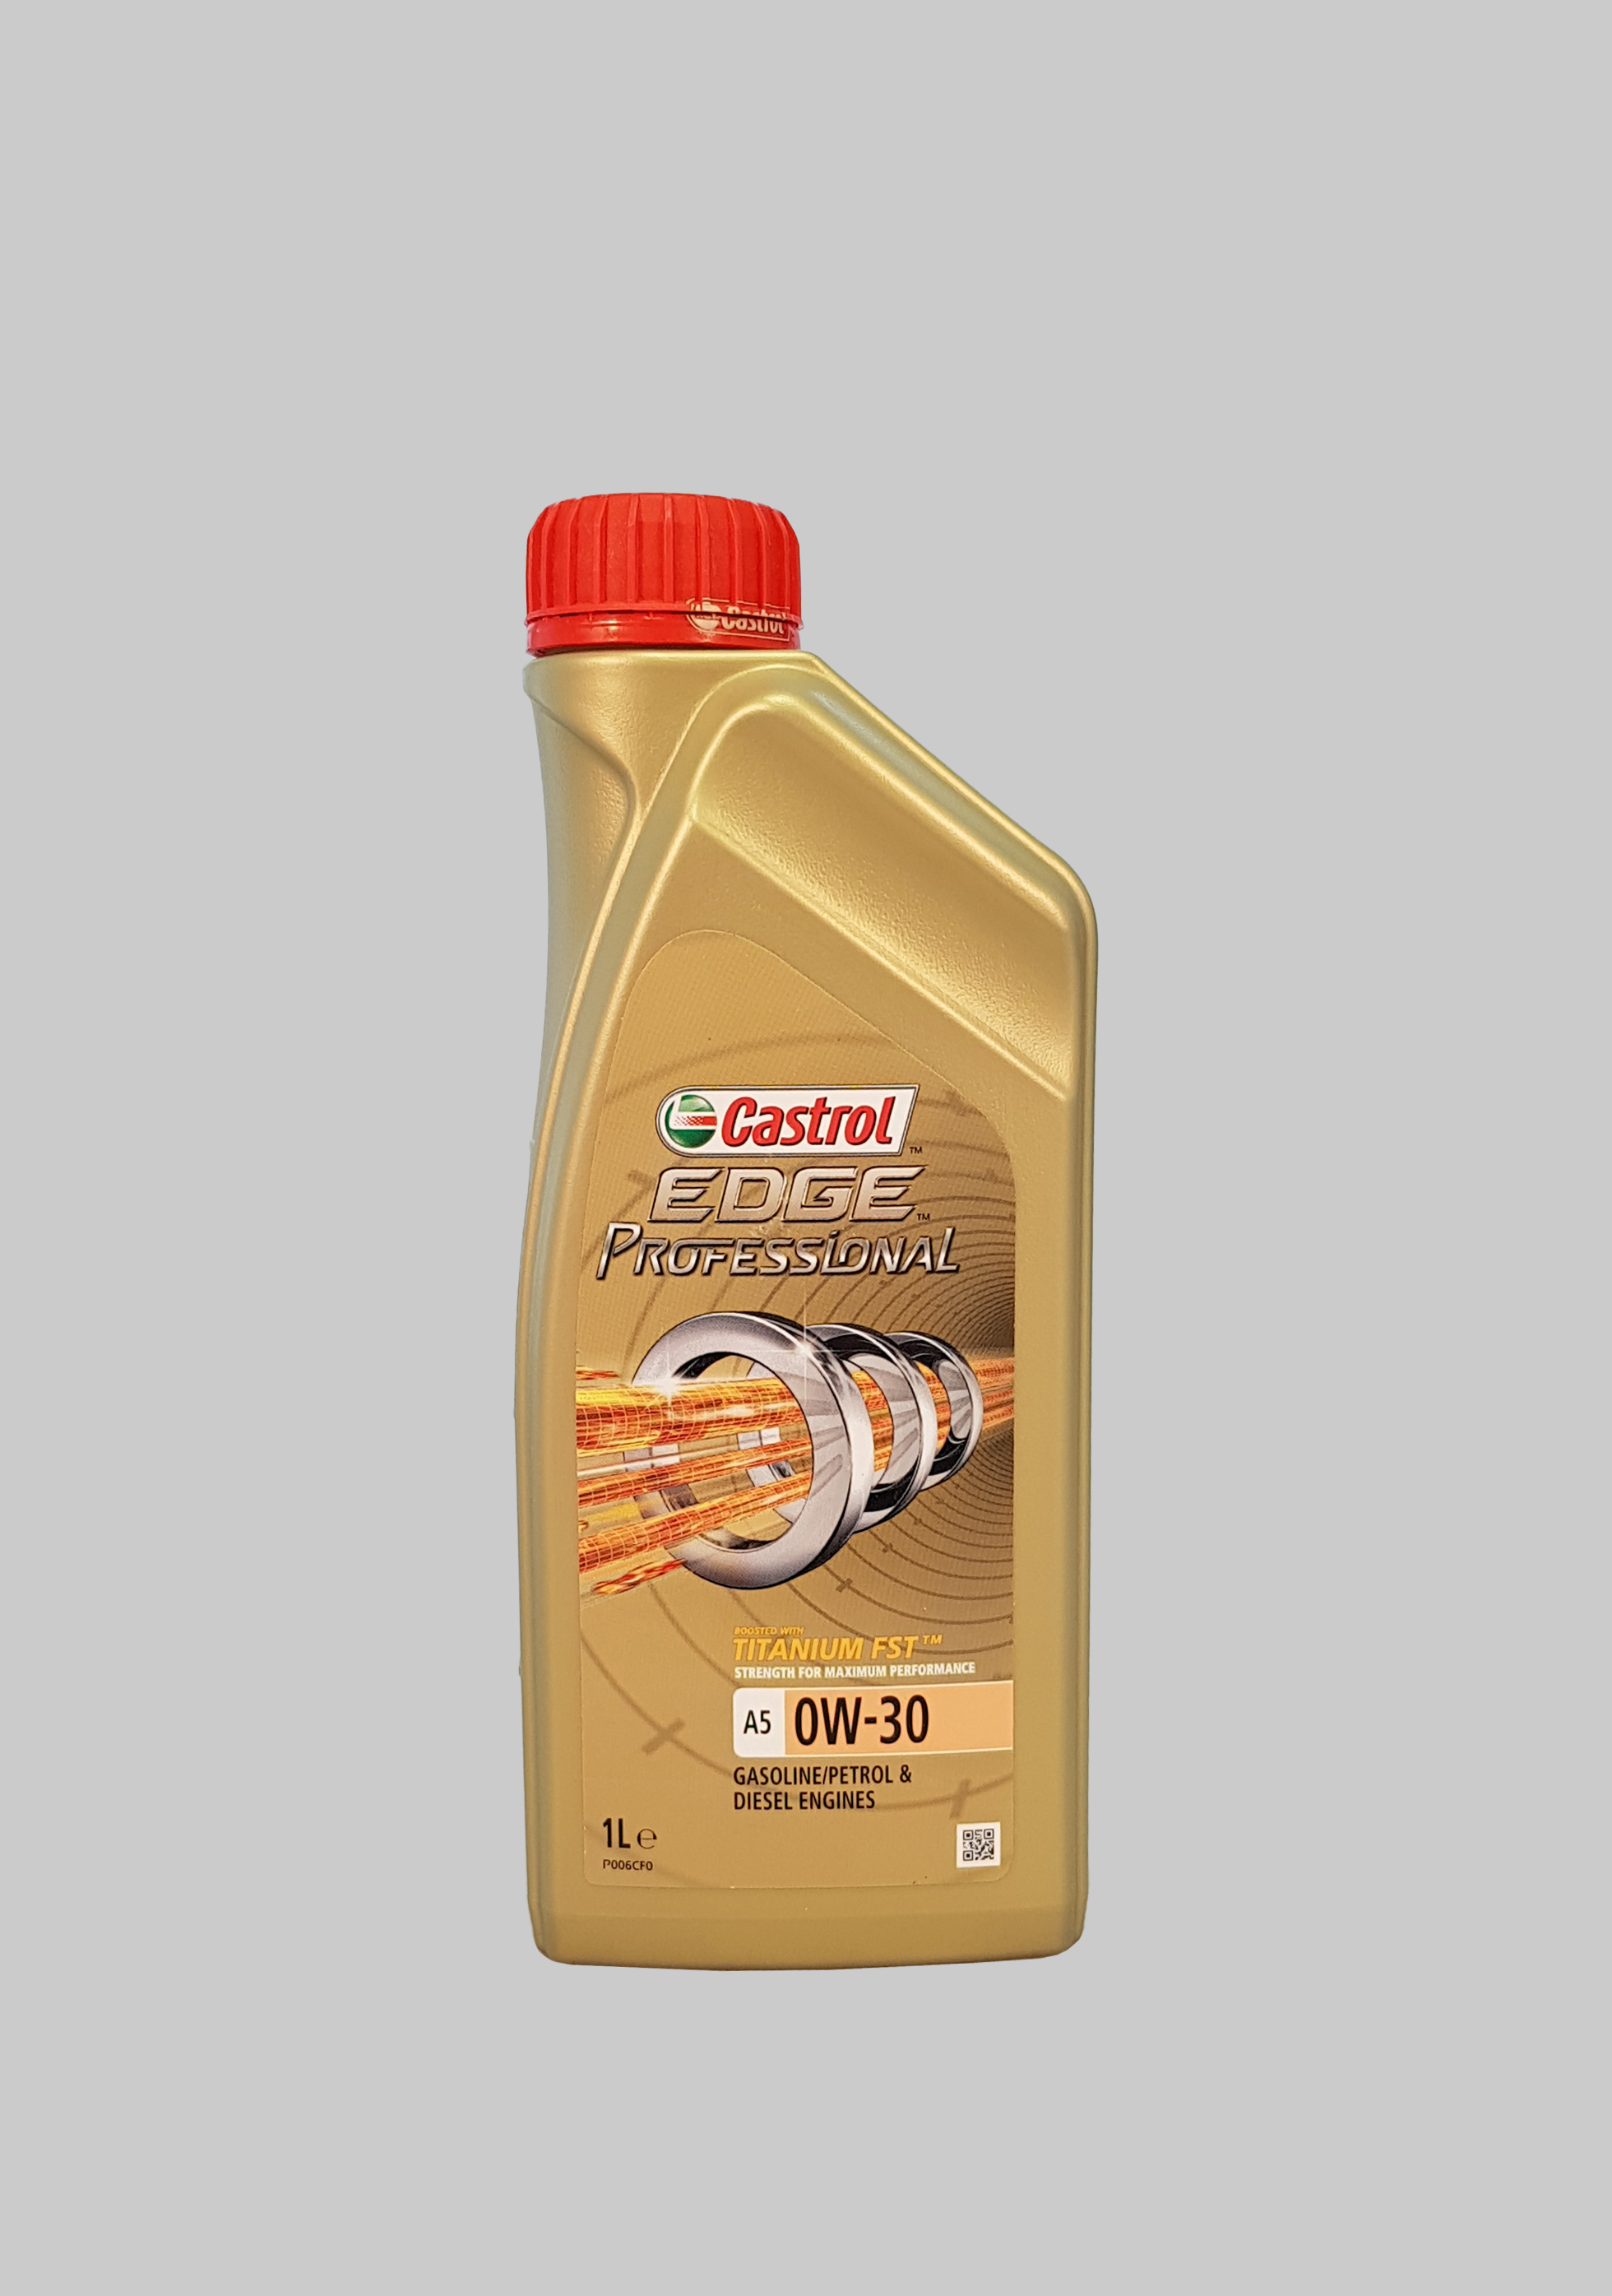 Castrol Edge Professional Titanium FST A5 0W-30 1 Liter